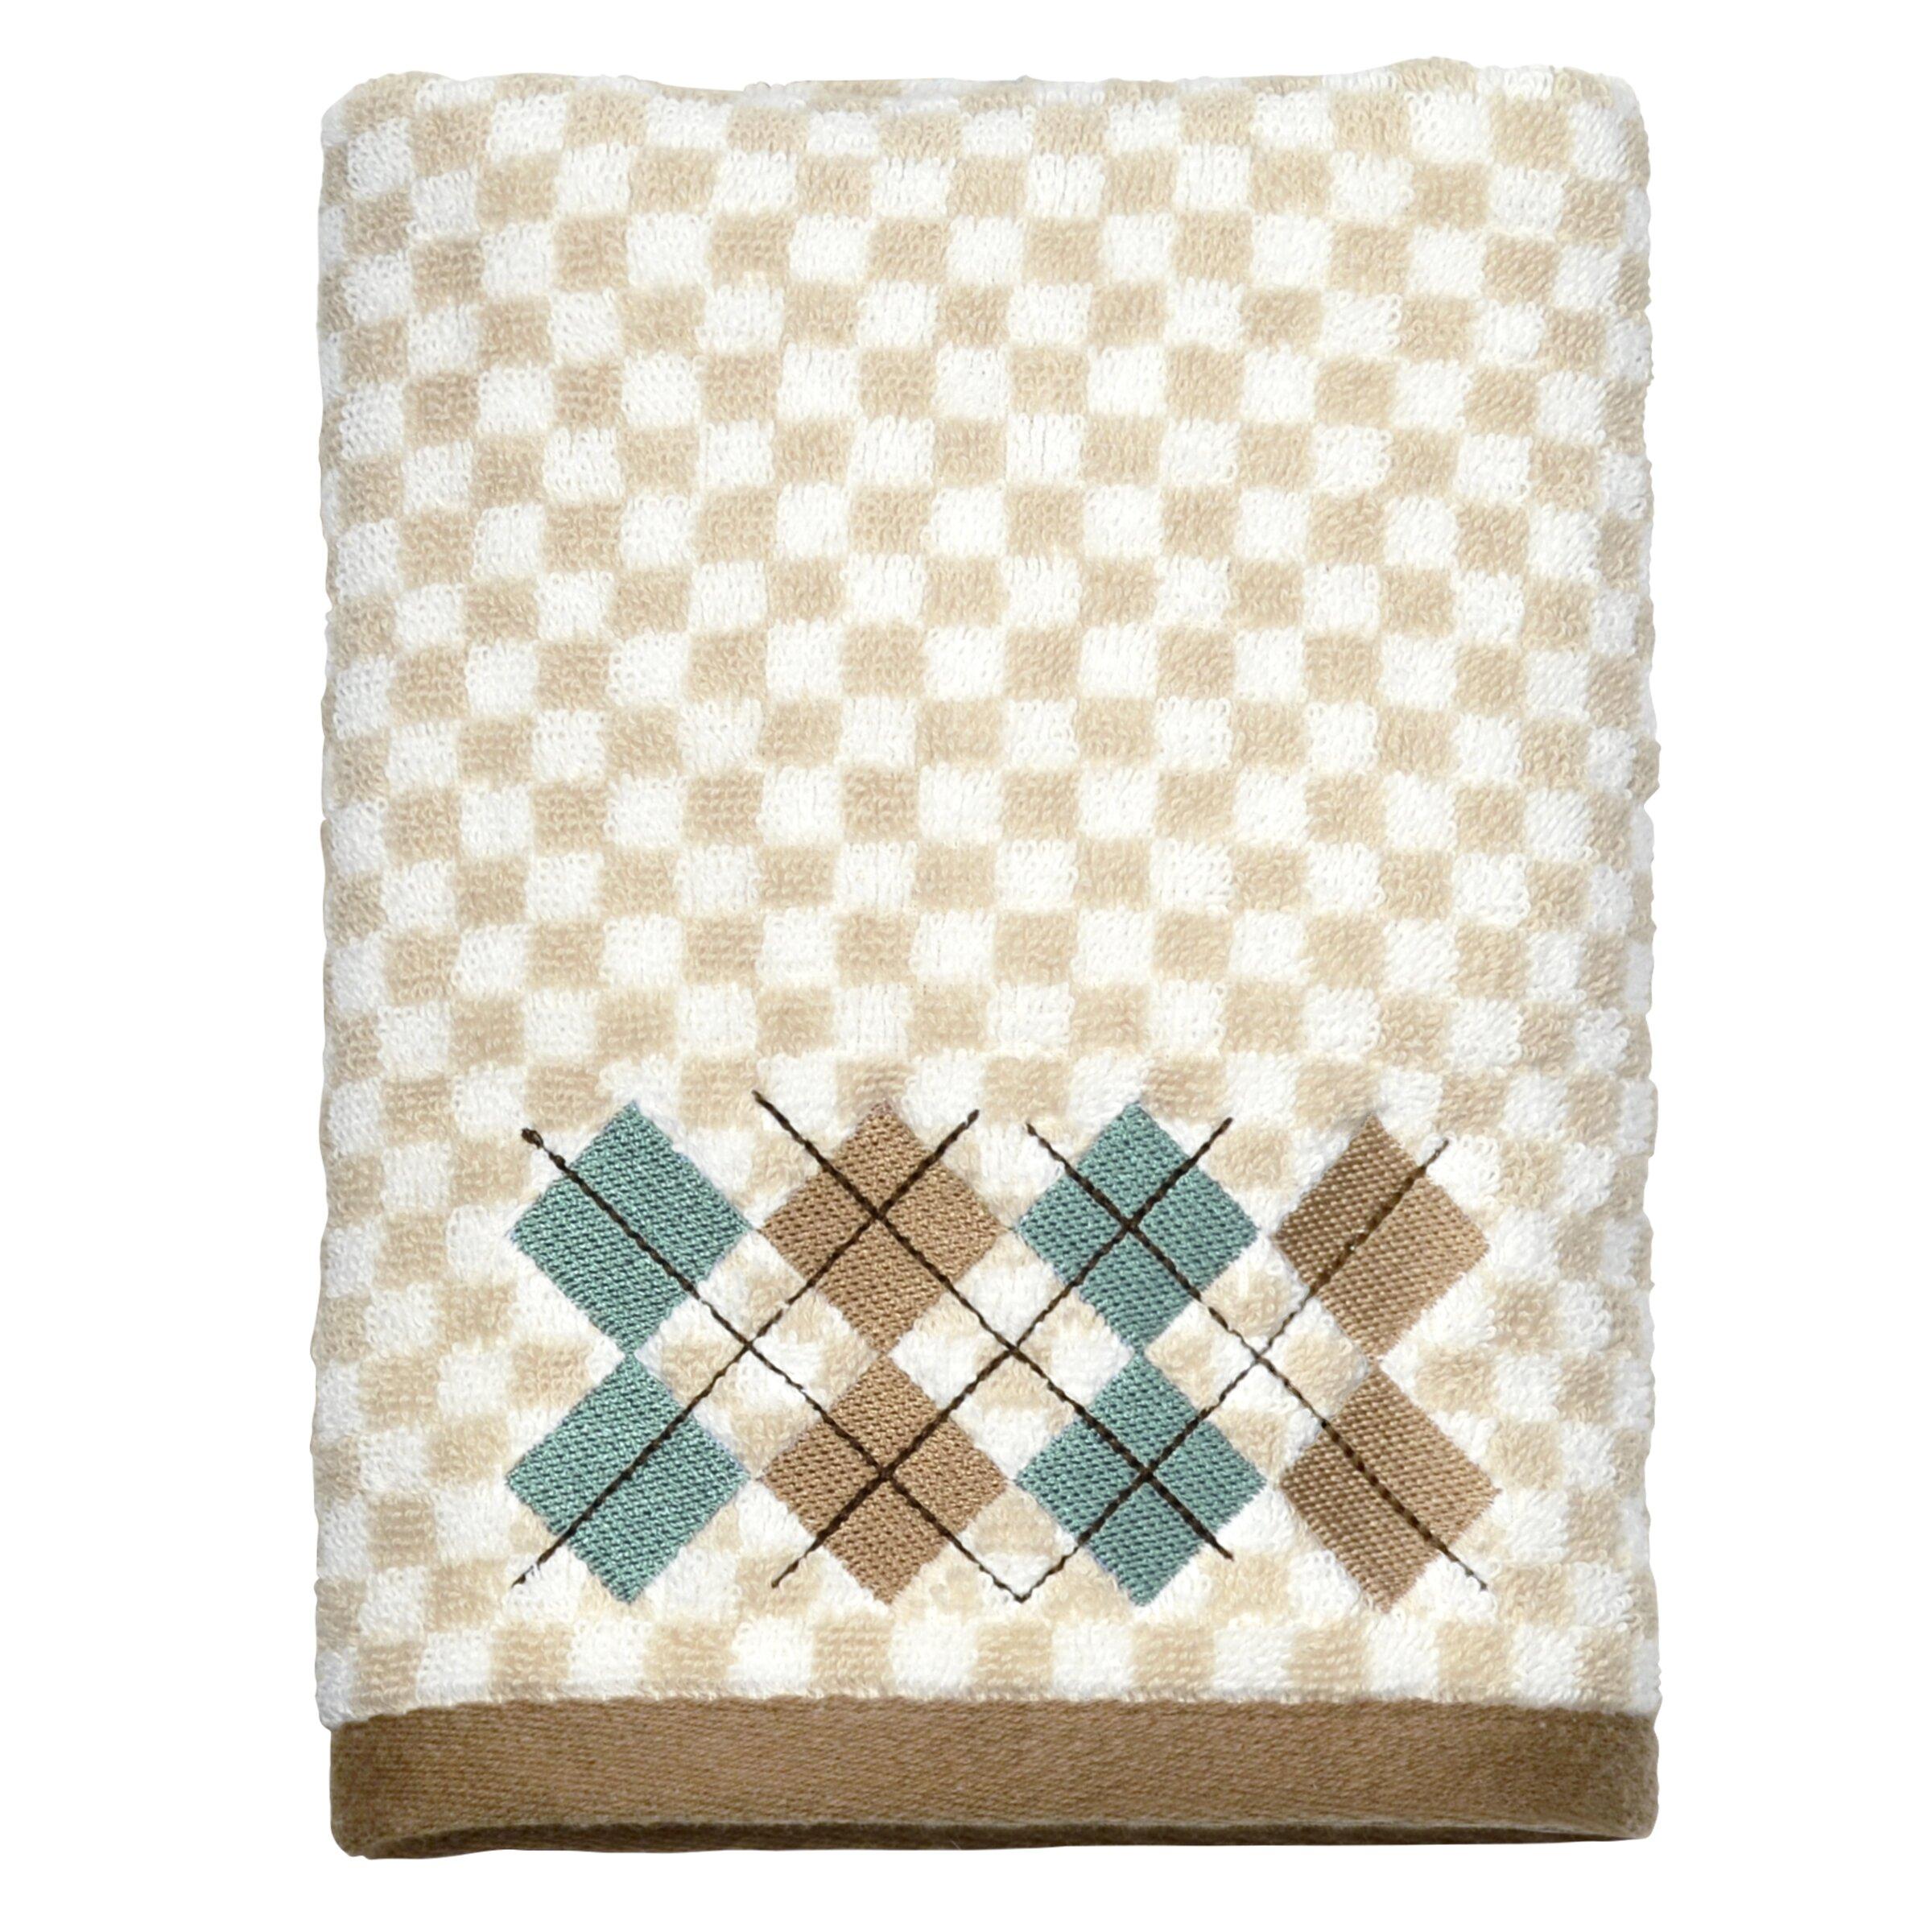 Peri Home Towels: Peri Home Argyle Hand Towel & Reviews